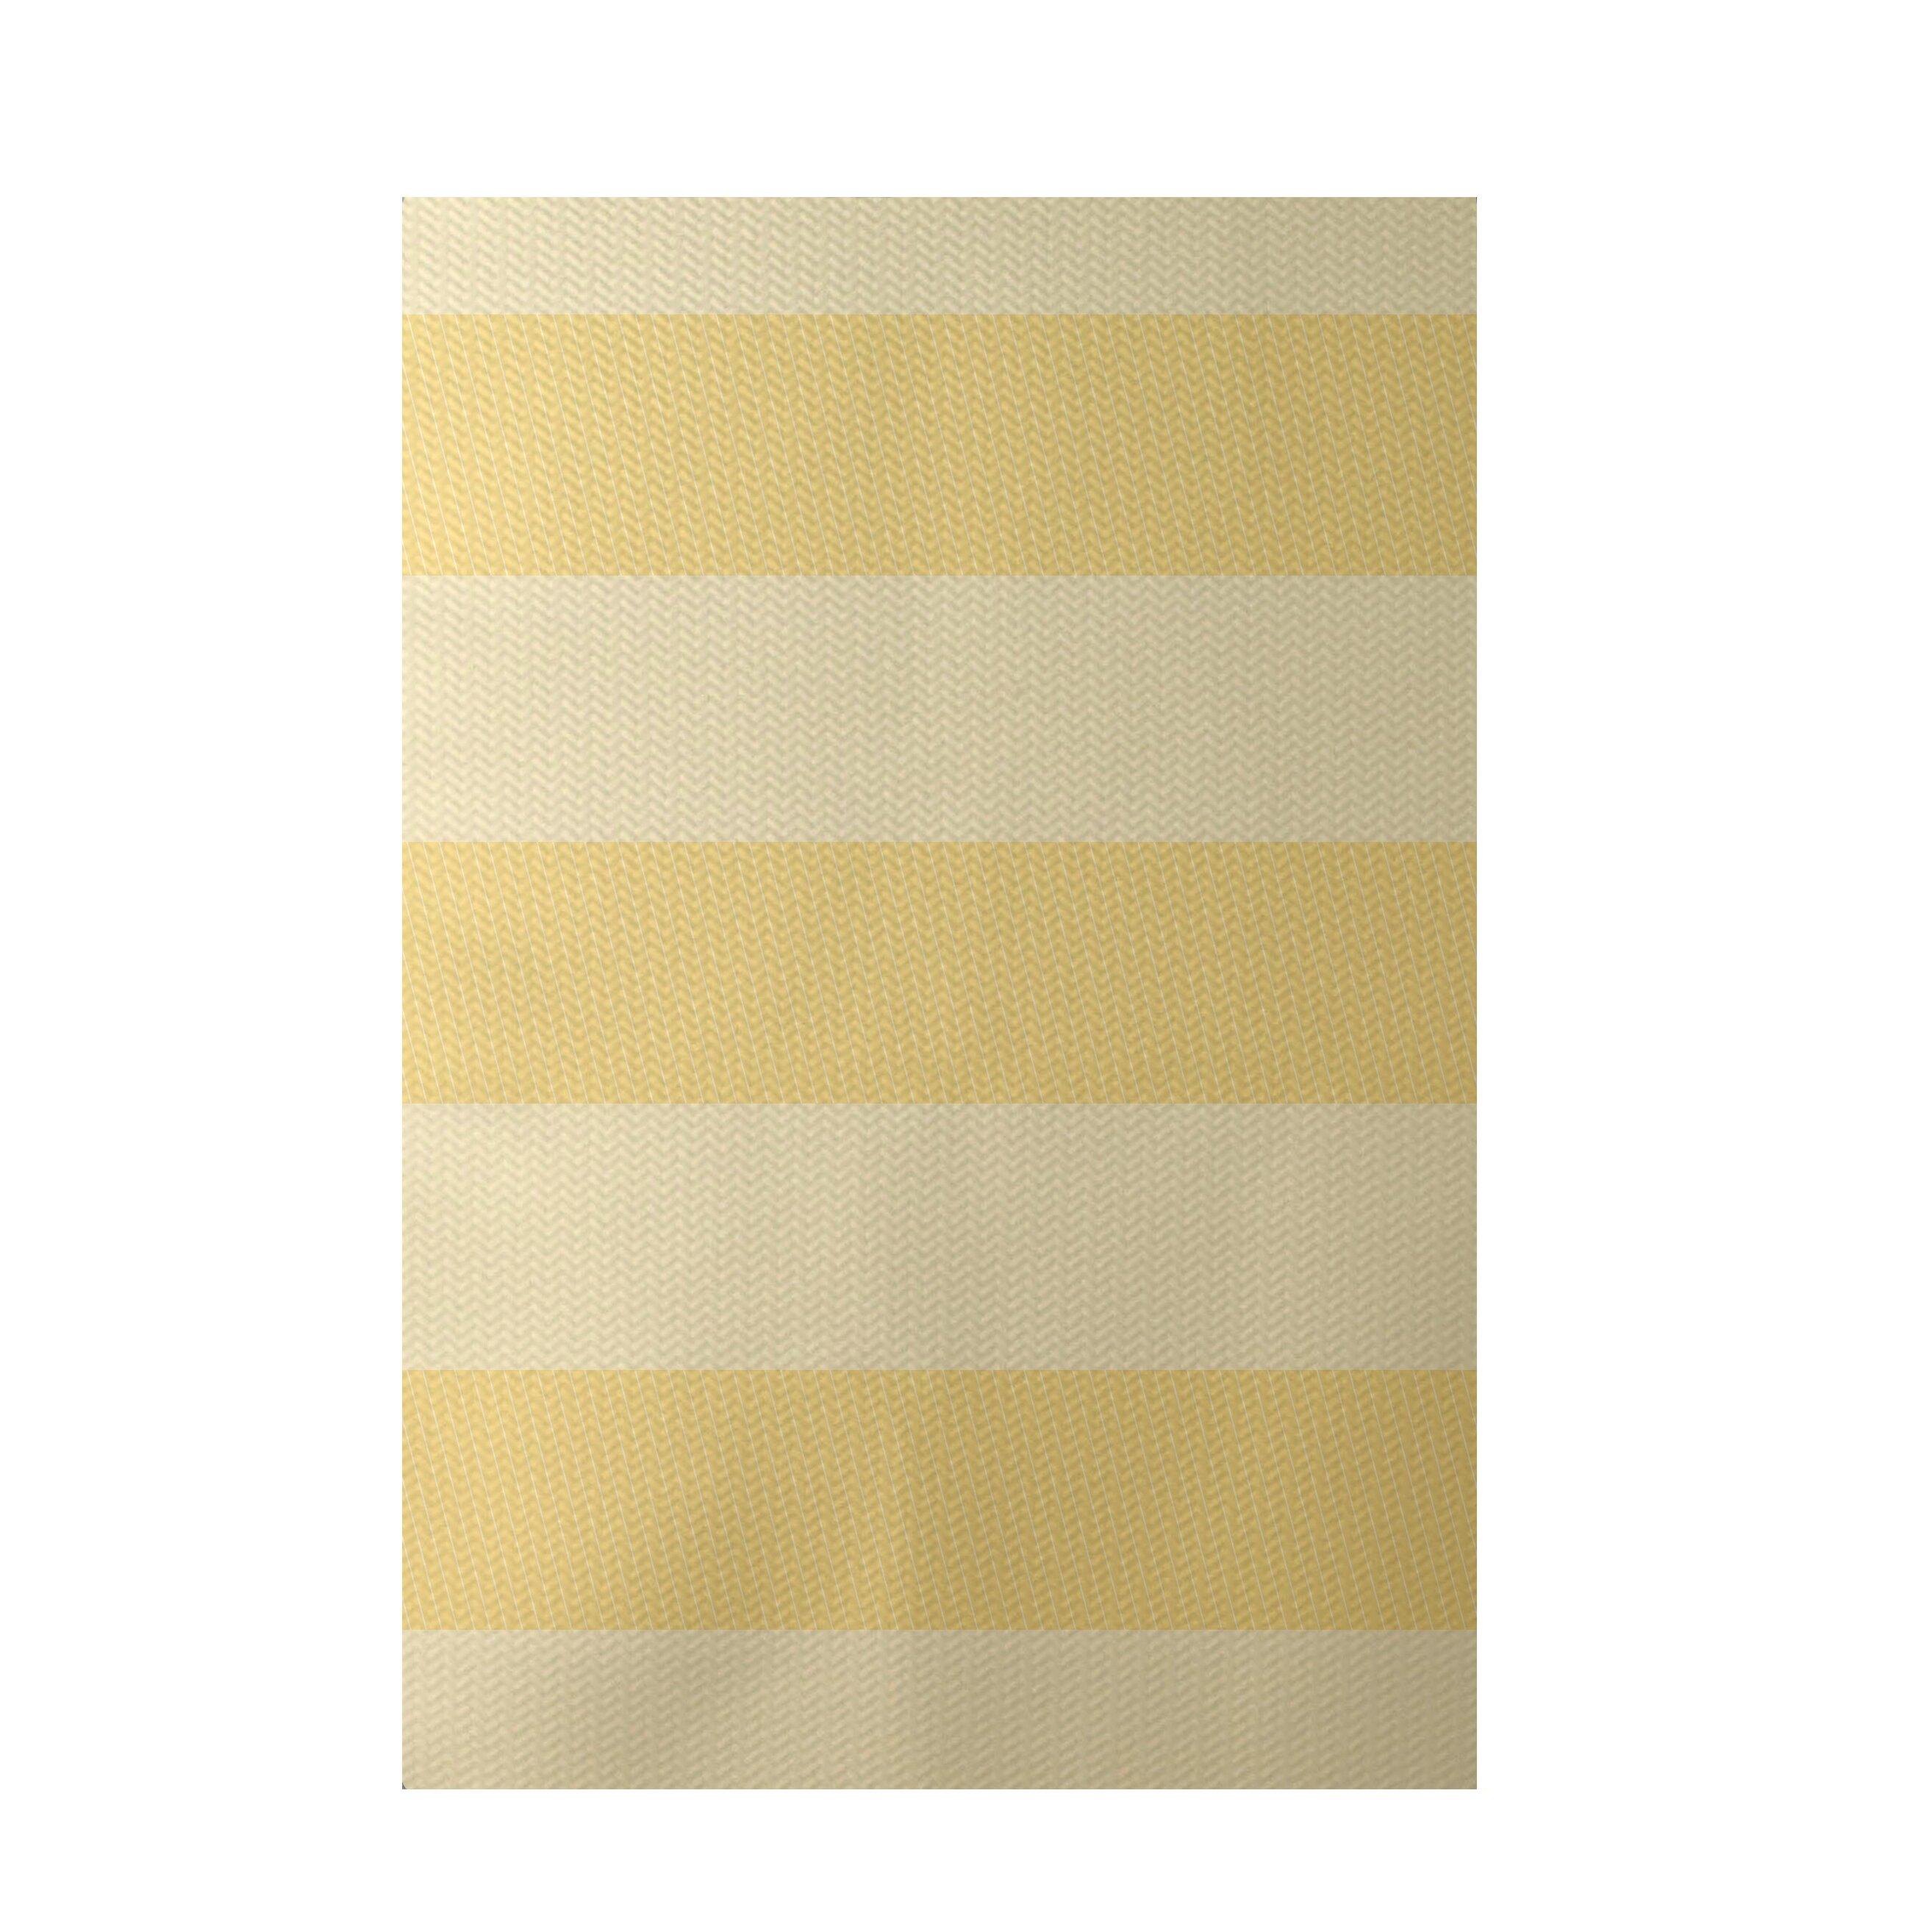 e by design Stripe Yellow Indoor Outdoor Area Rug